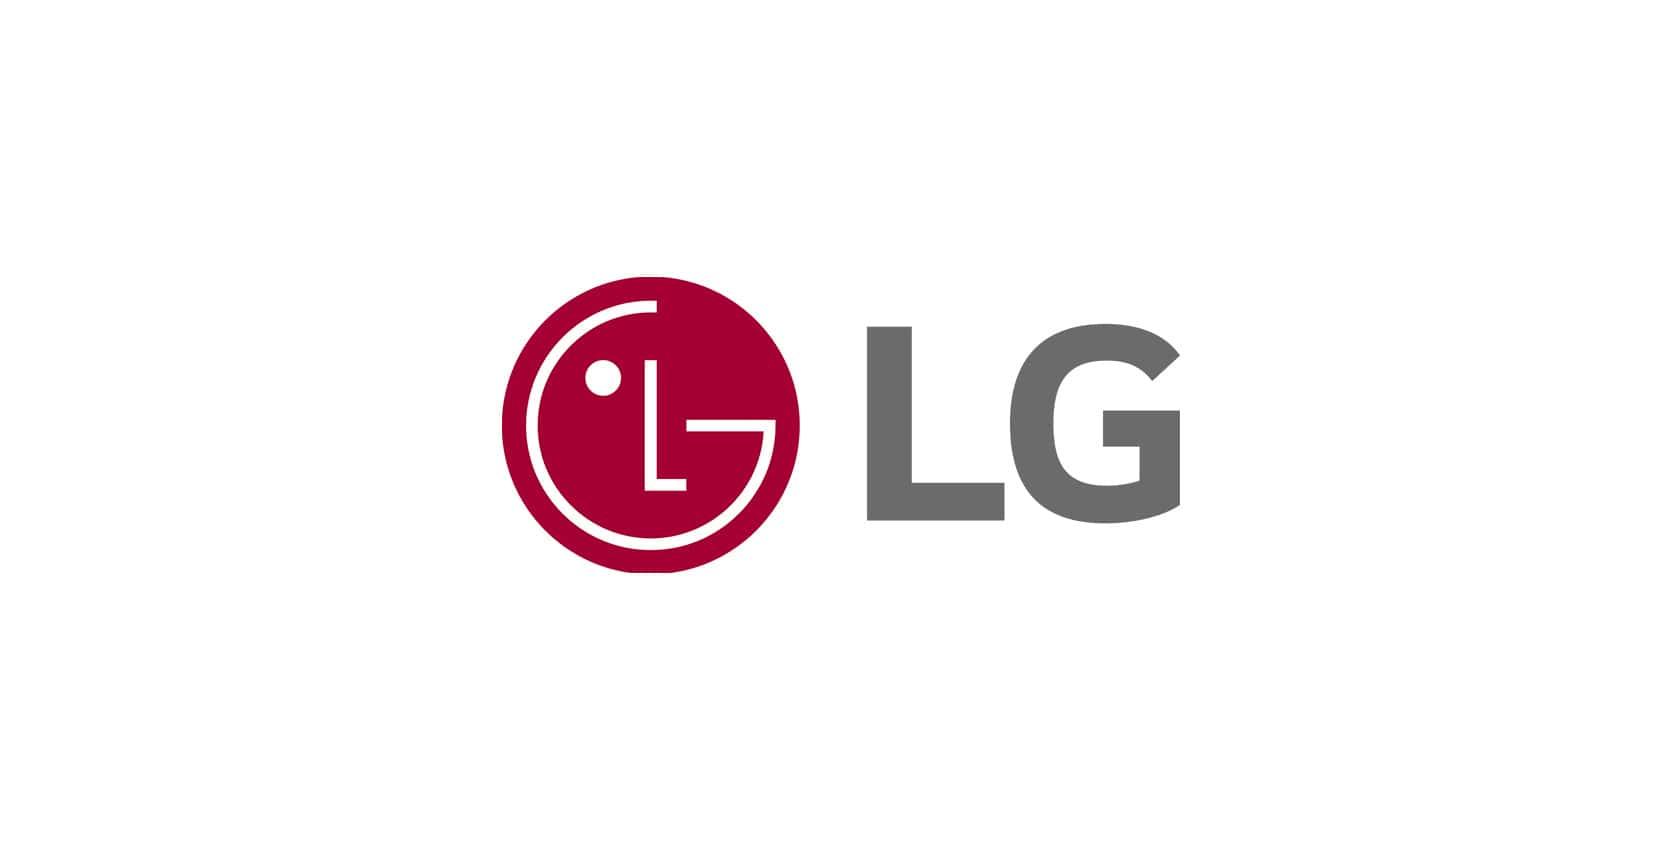 LG Musteri Hizmetleri min